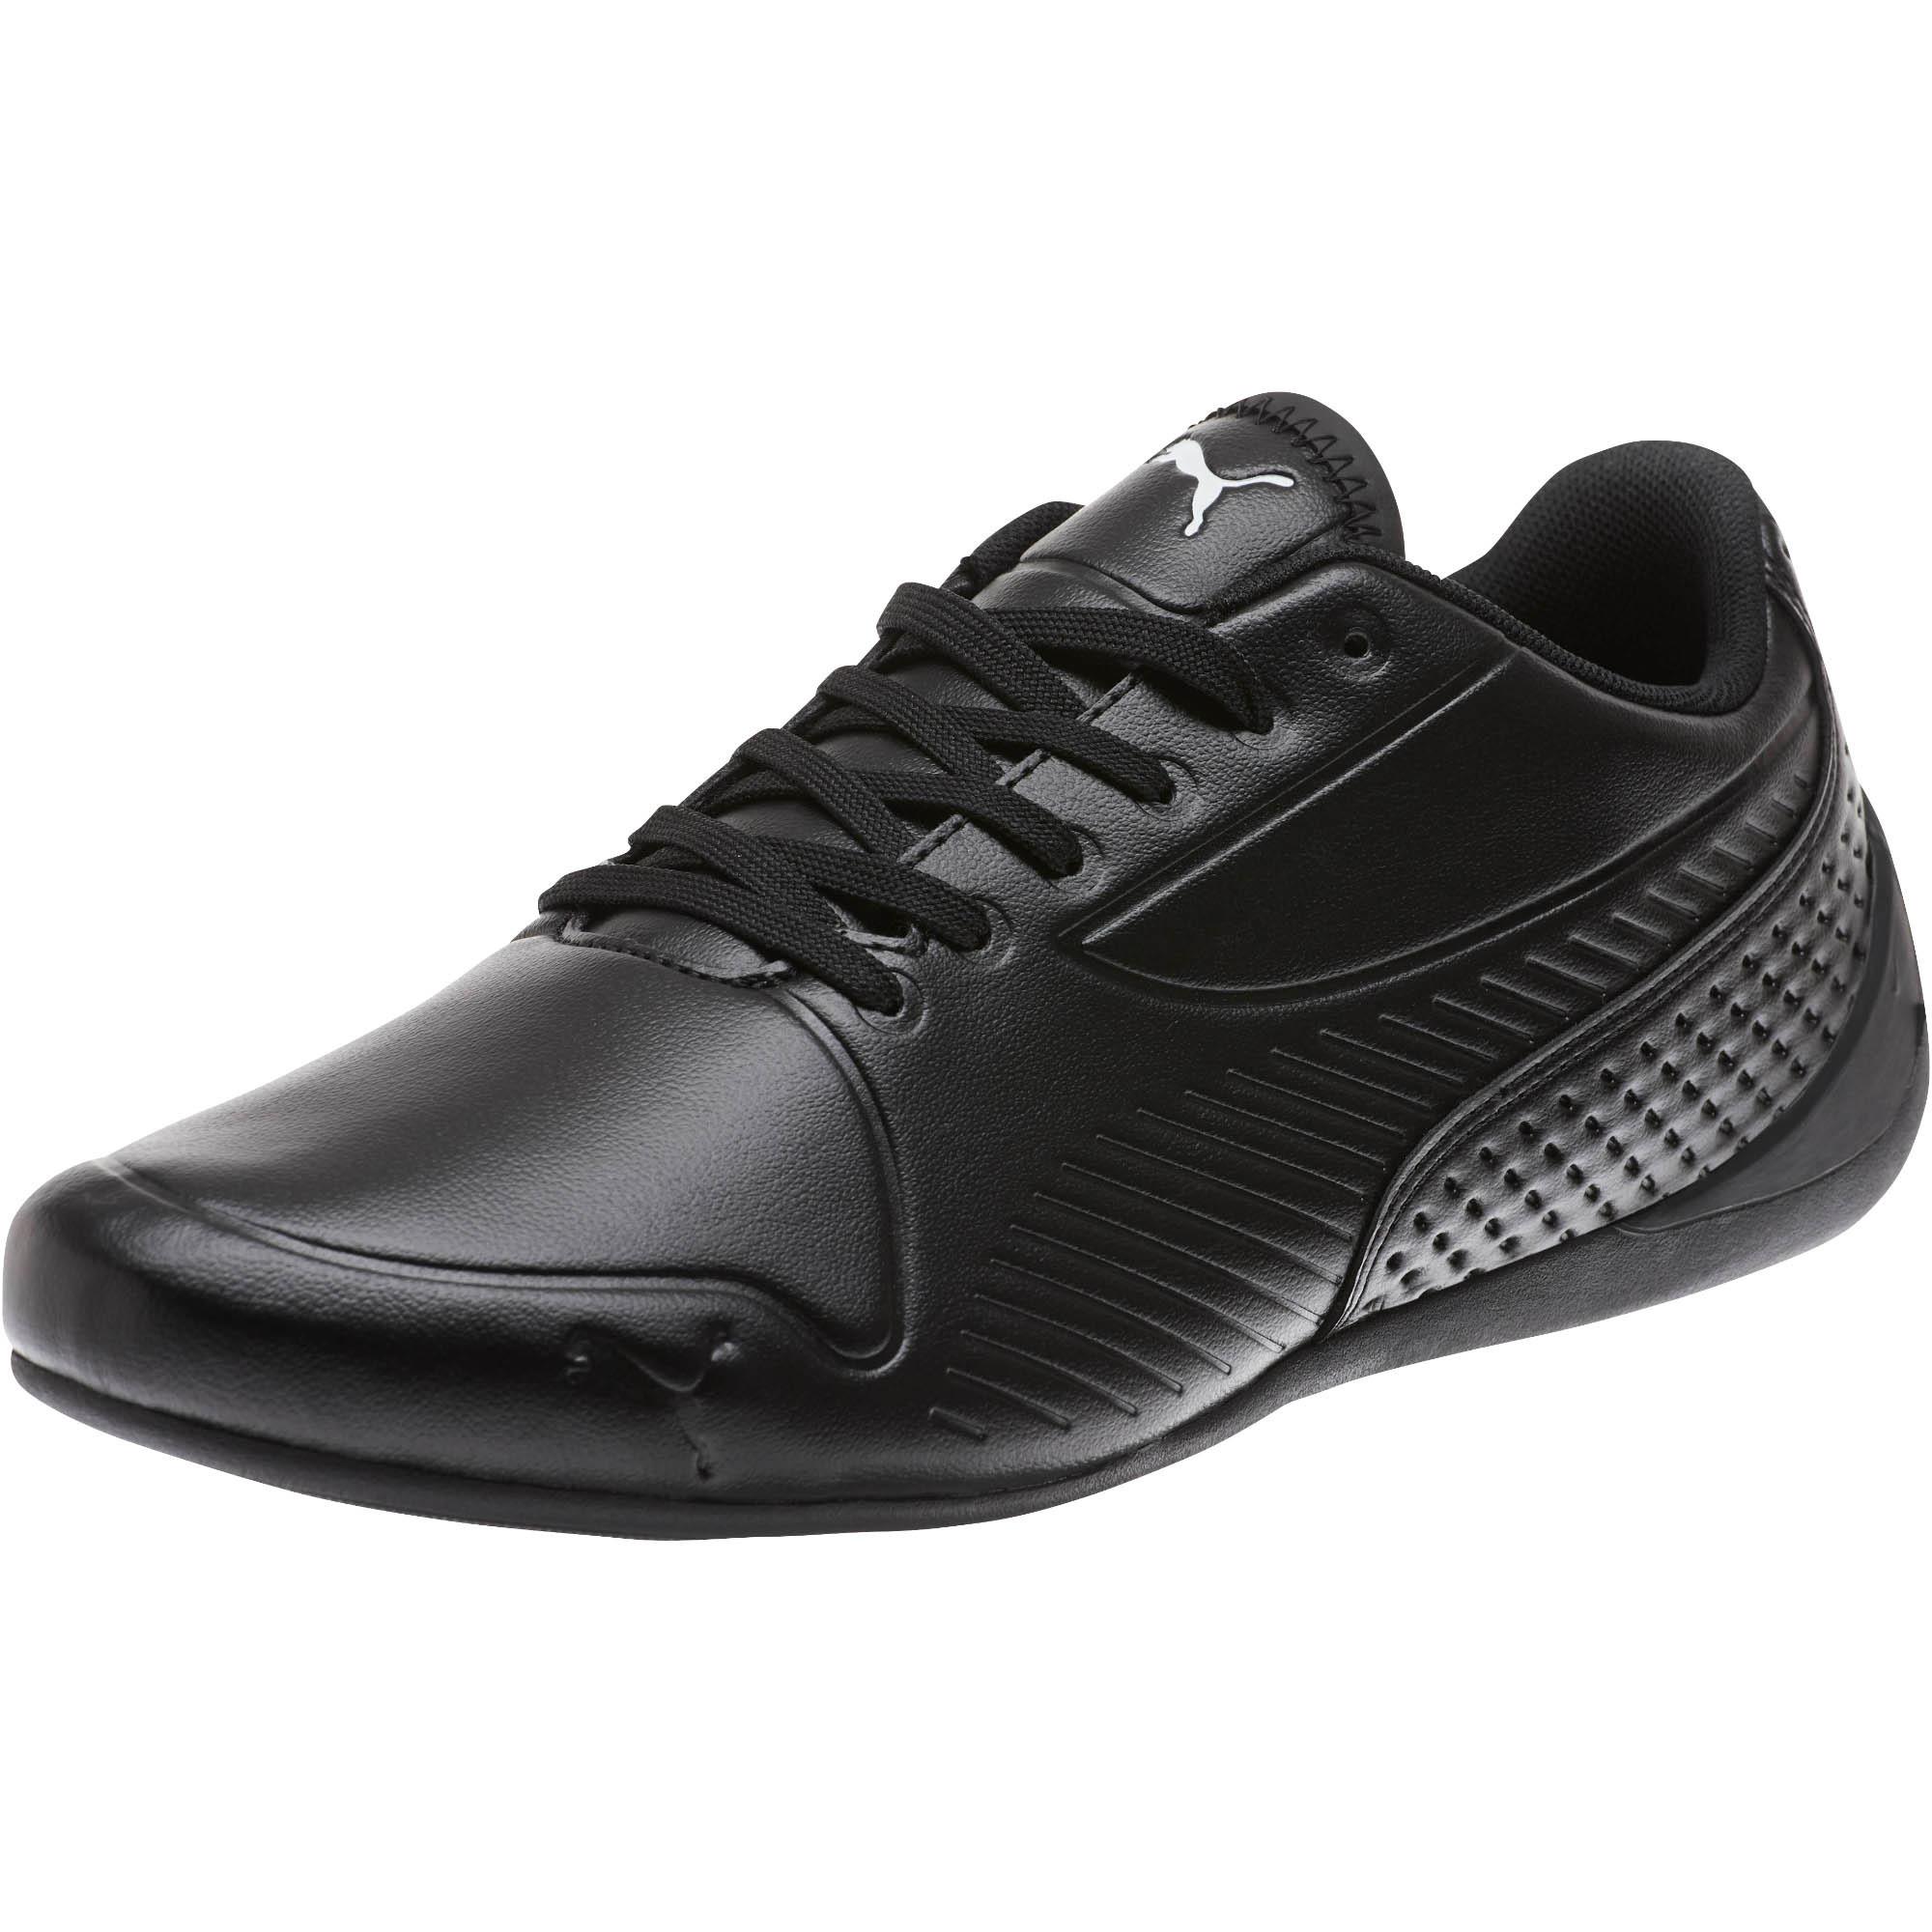 PUMA Drift Cat 7S Ultra Men's Shoes (black or white) $27.50 + Free Shipping